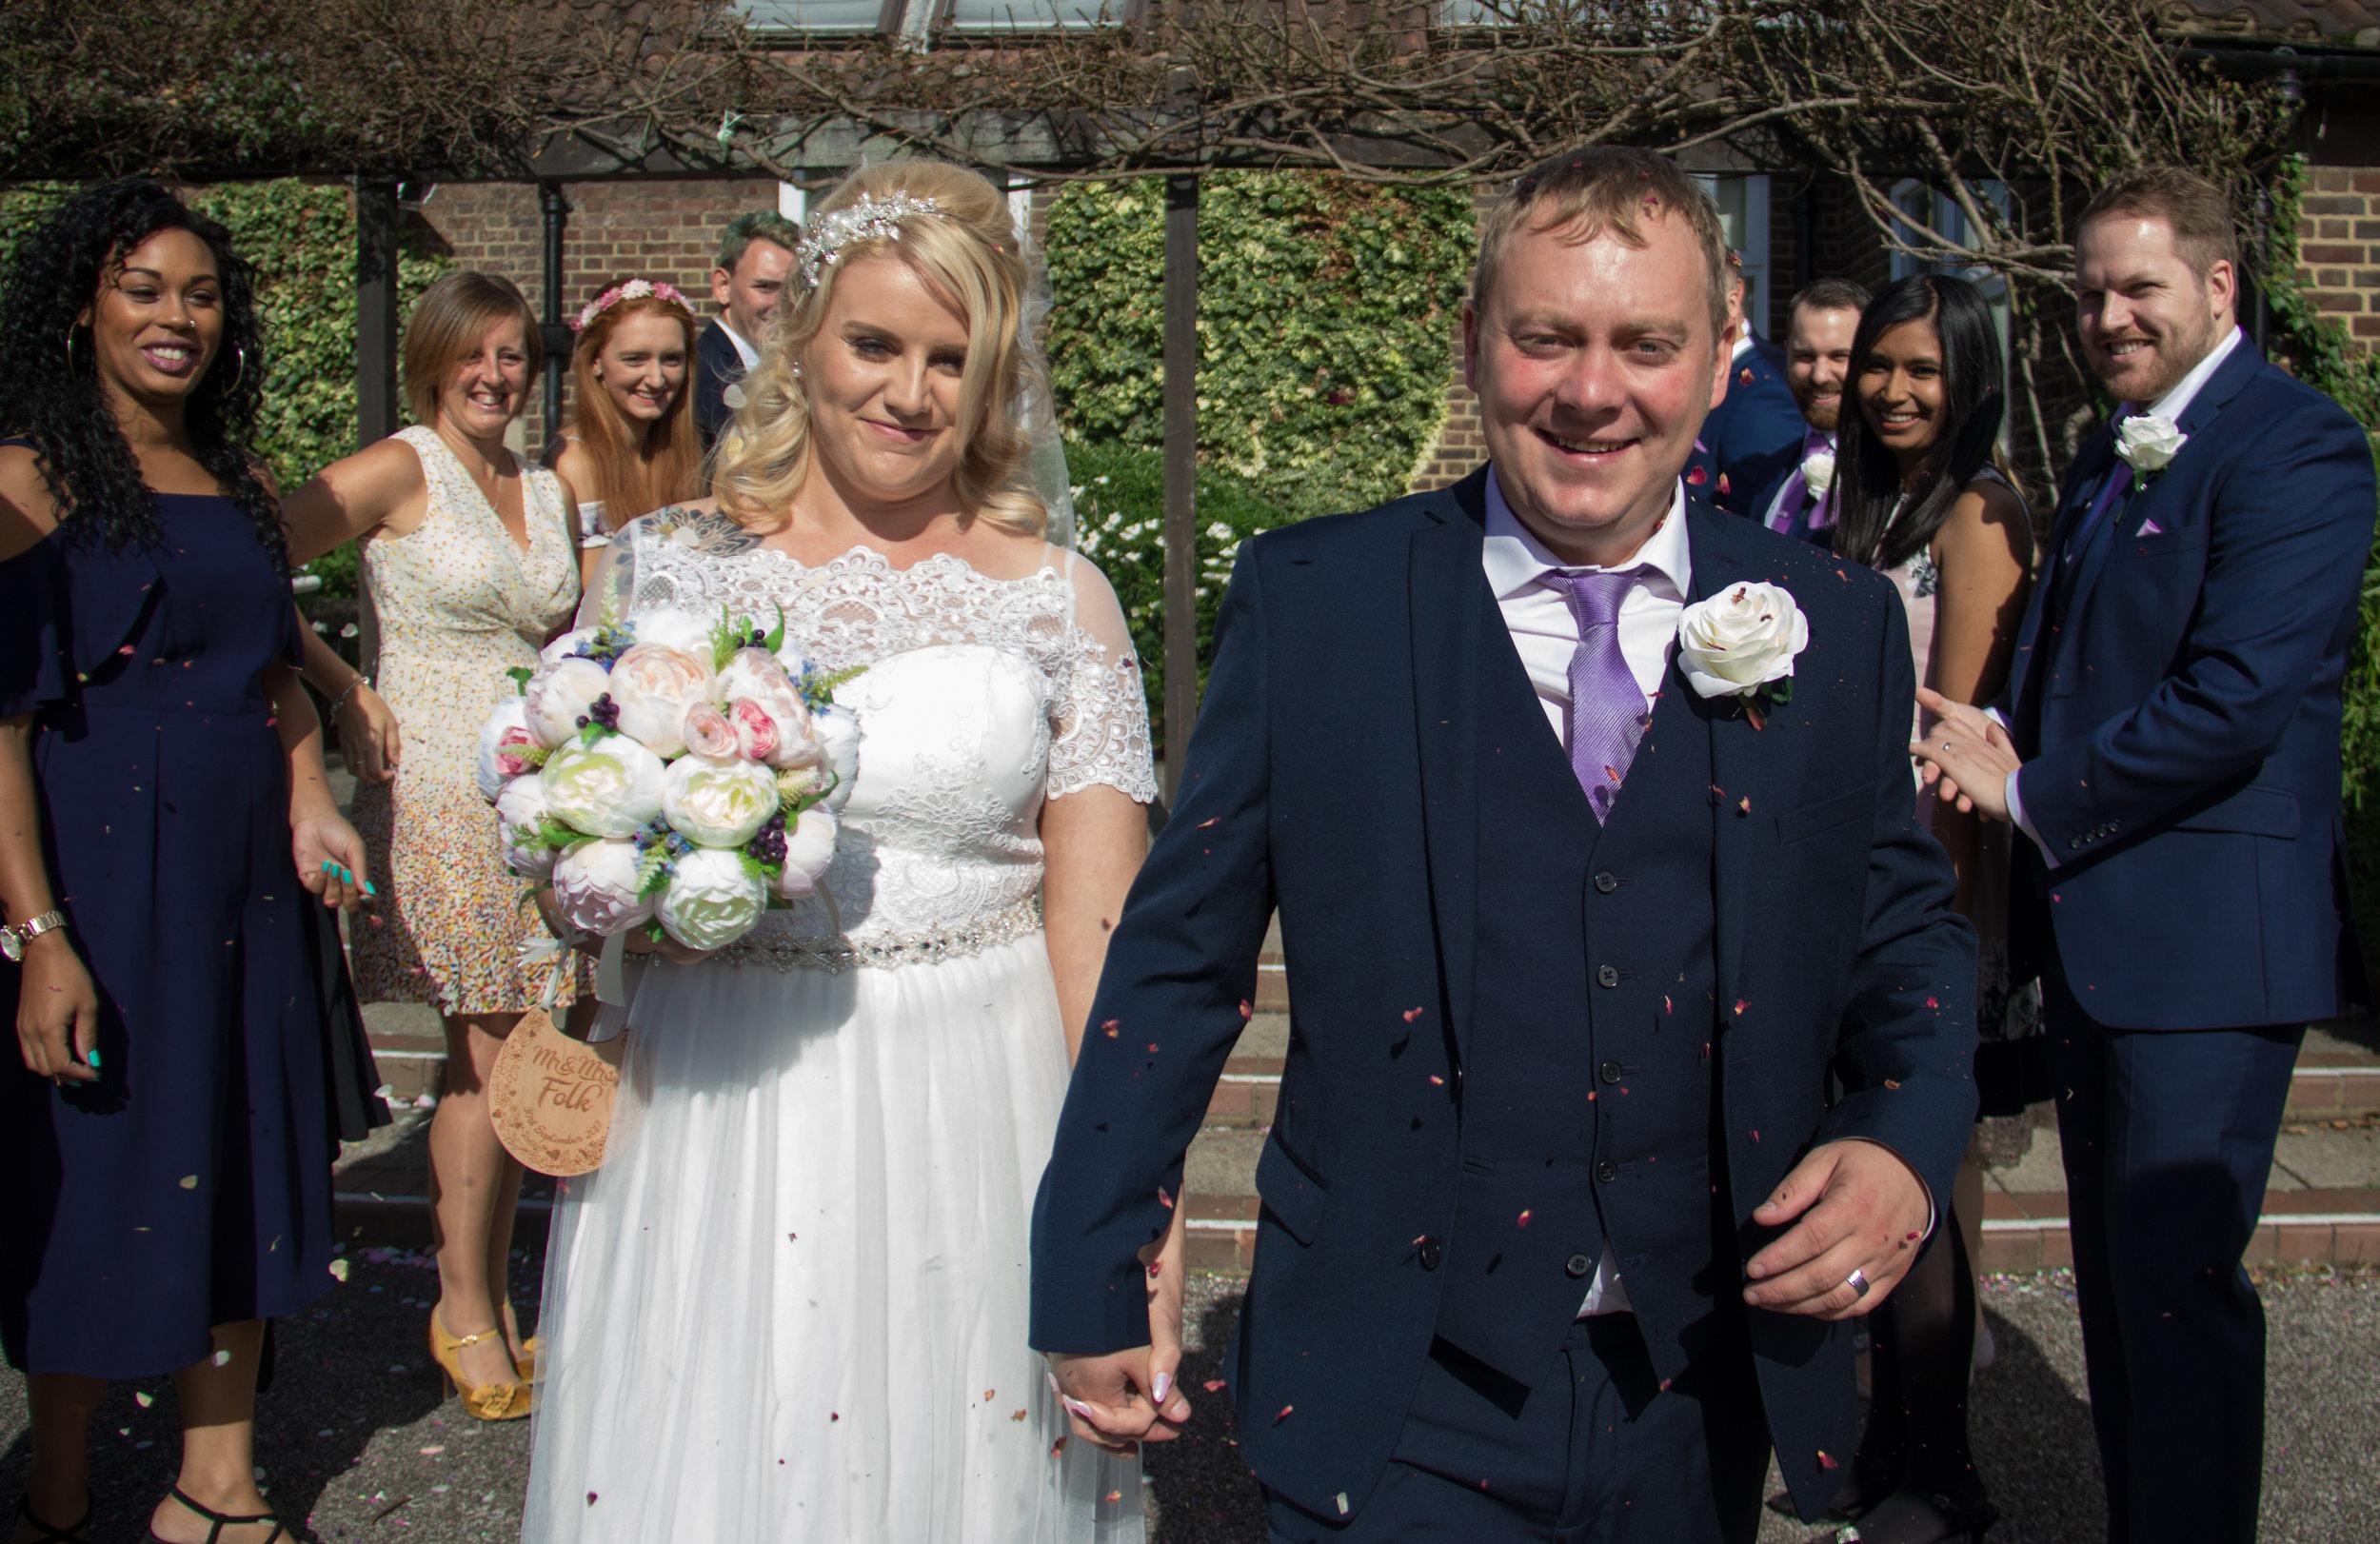 Me on my own wedding day next to my beautiful wife Becca.  Photo taken by: Jason Mitchell  https://www.skylarkphotography.co.uk